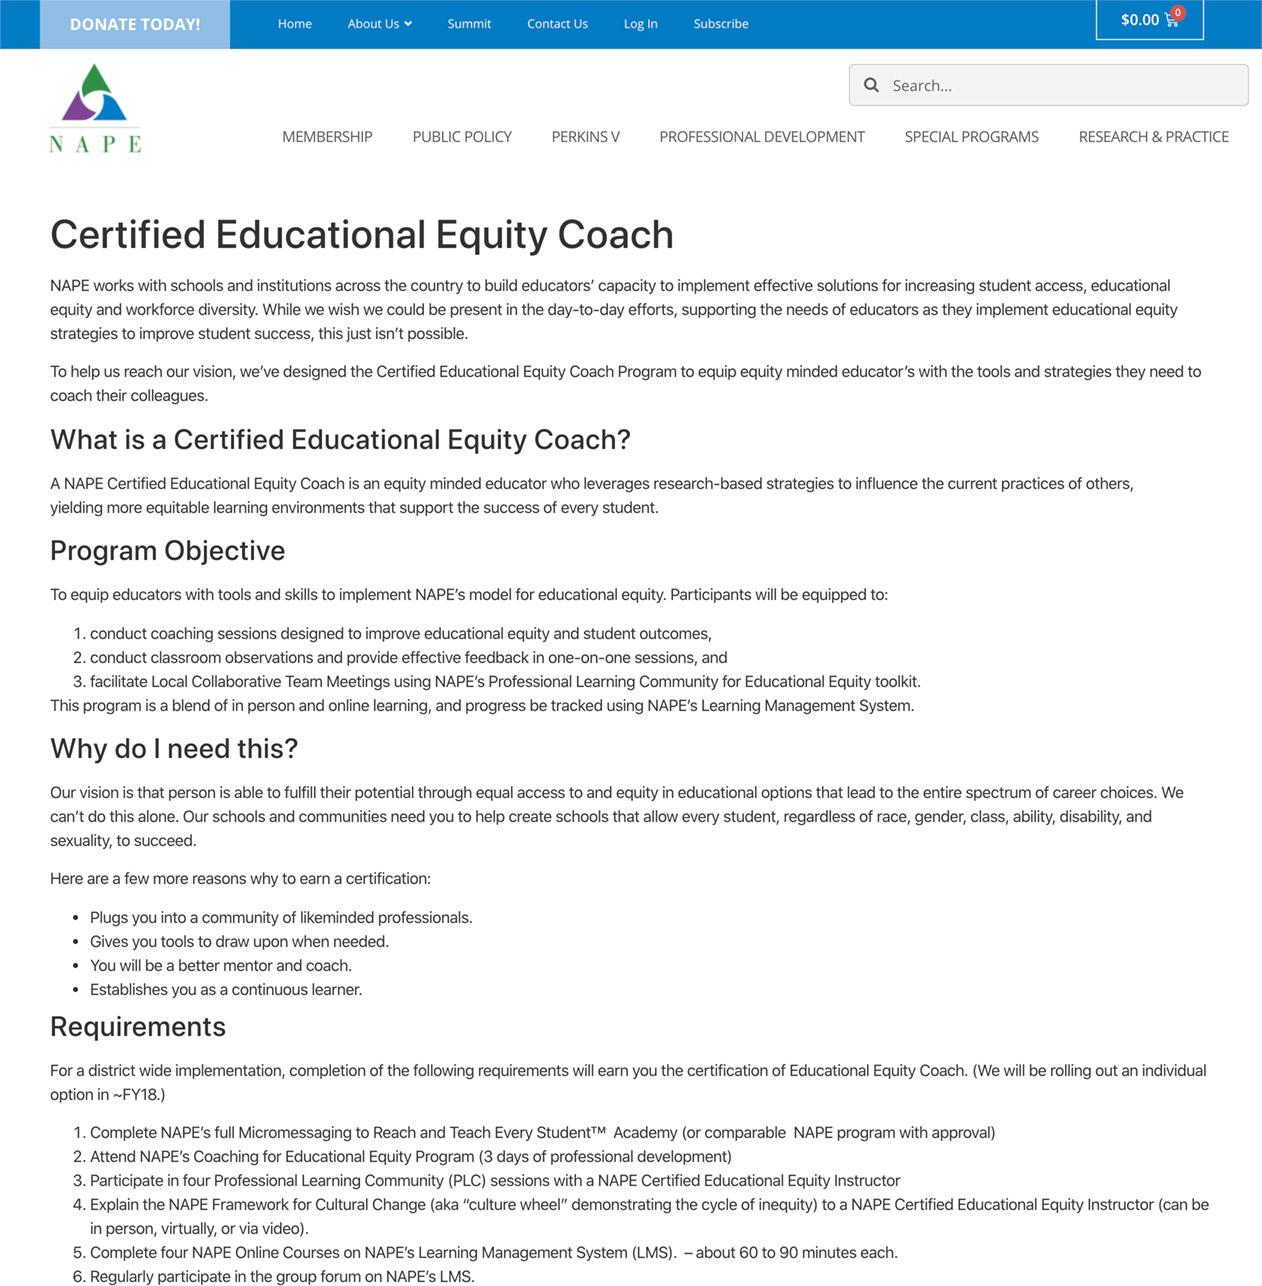 Certified Educational Equity Coach